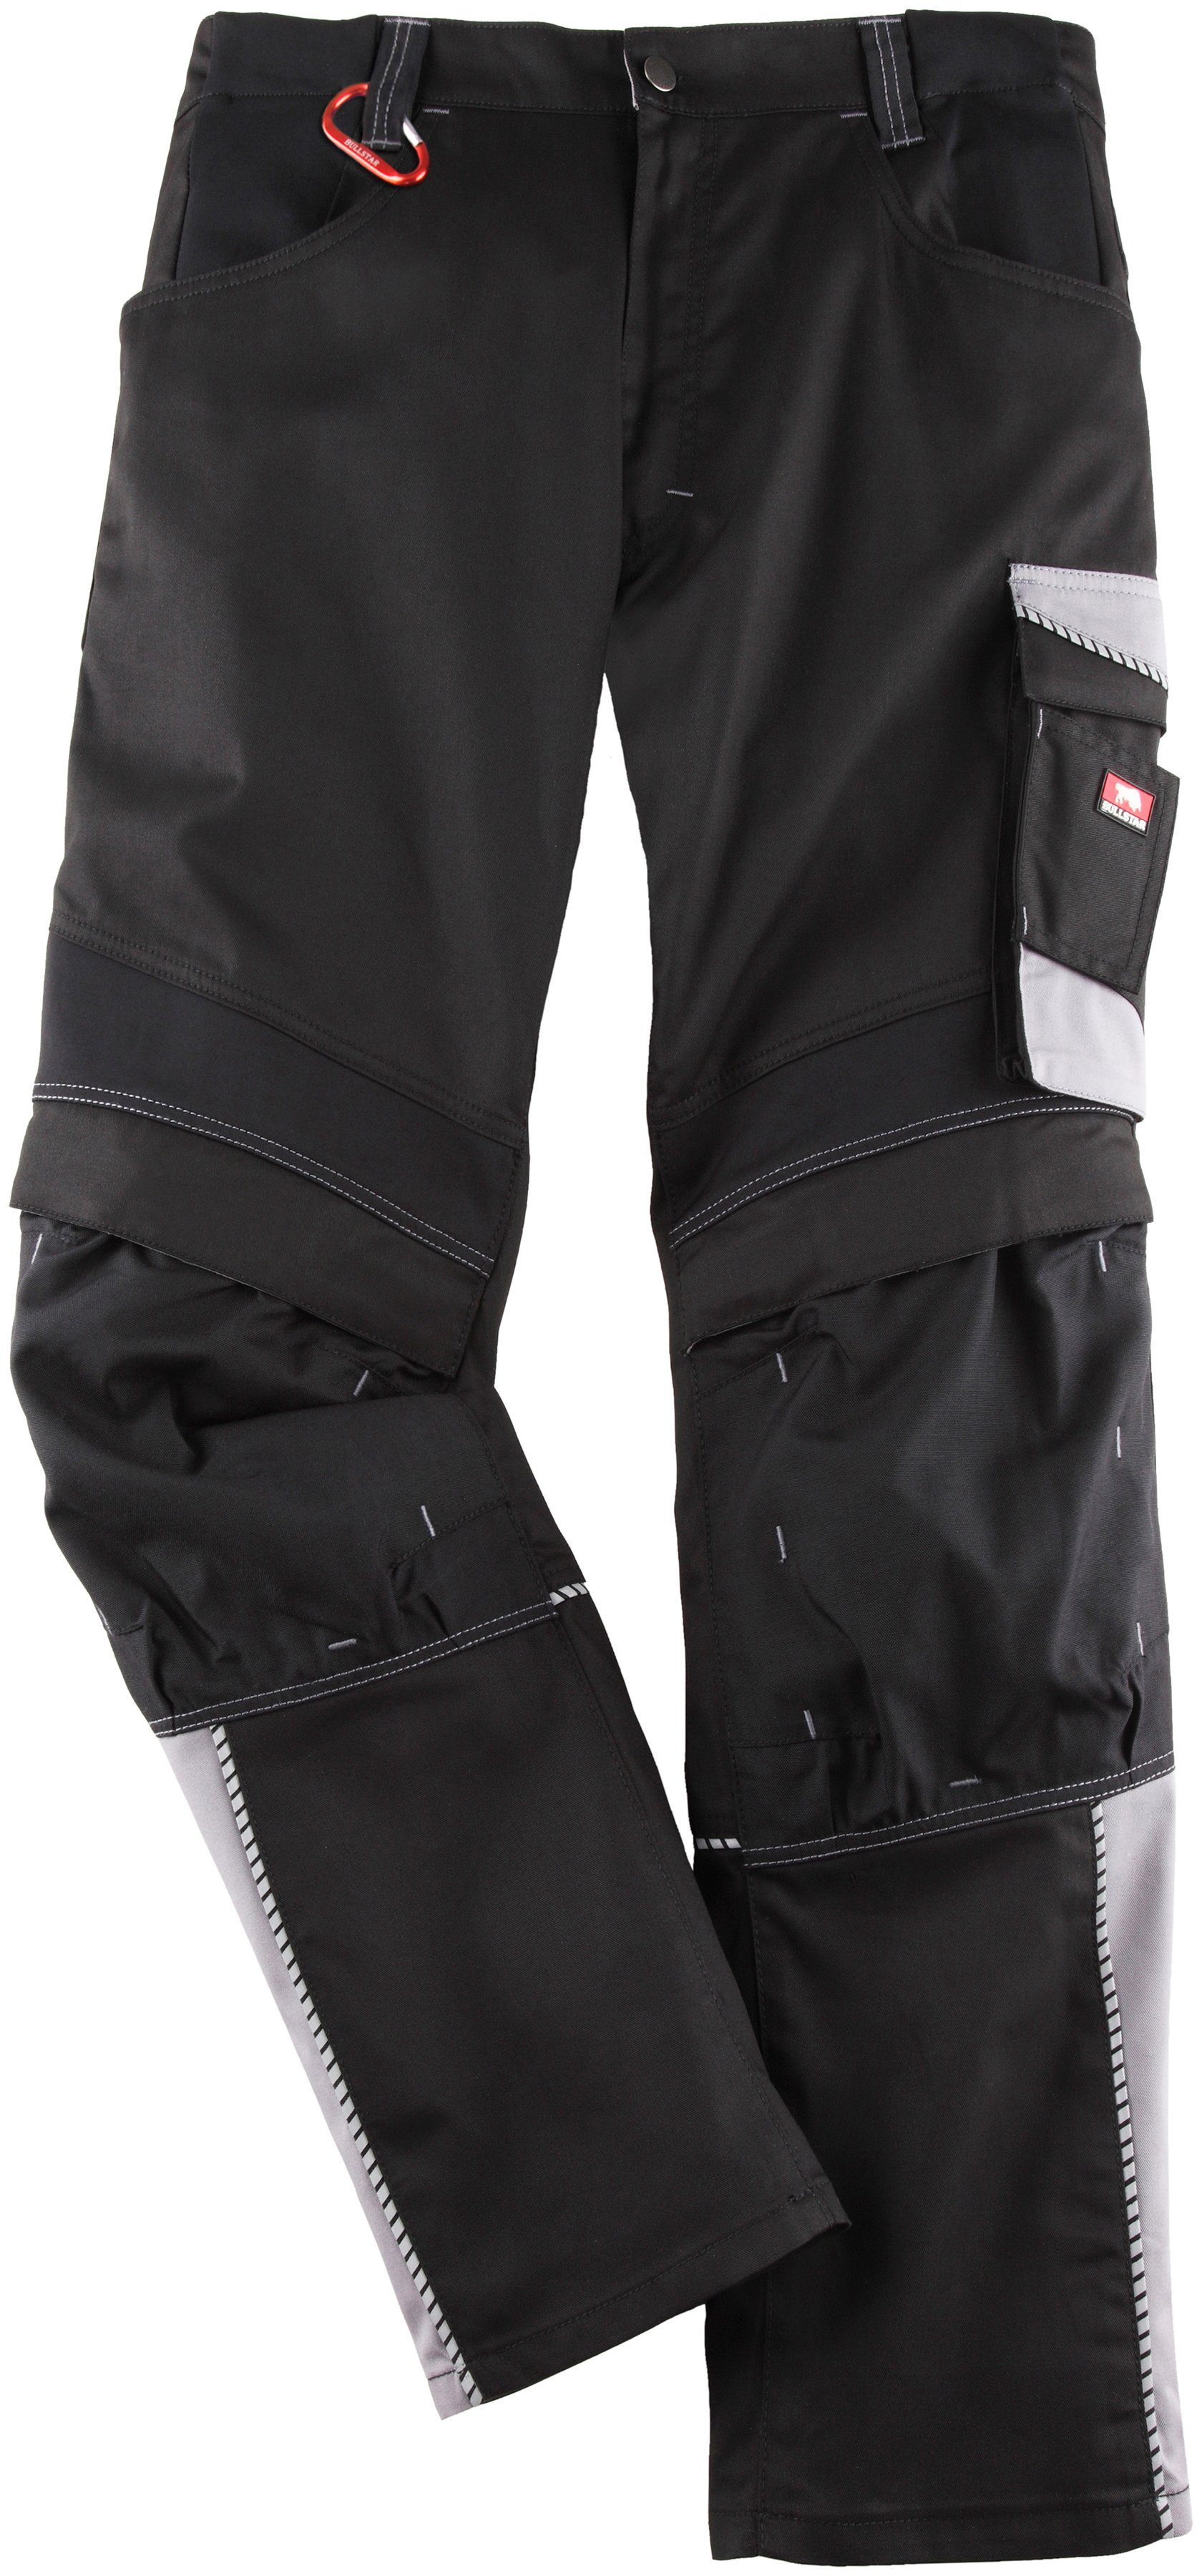 42 Herren Bullstar Arbeitshose Bundhose EVO schwarz//grau Gr